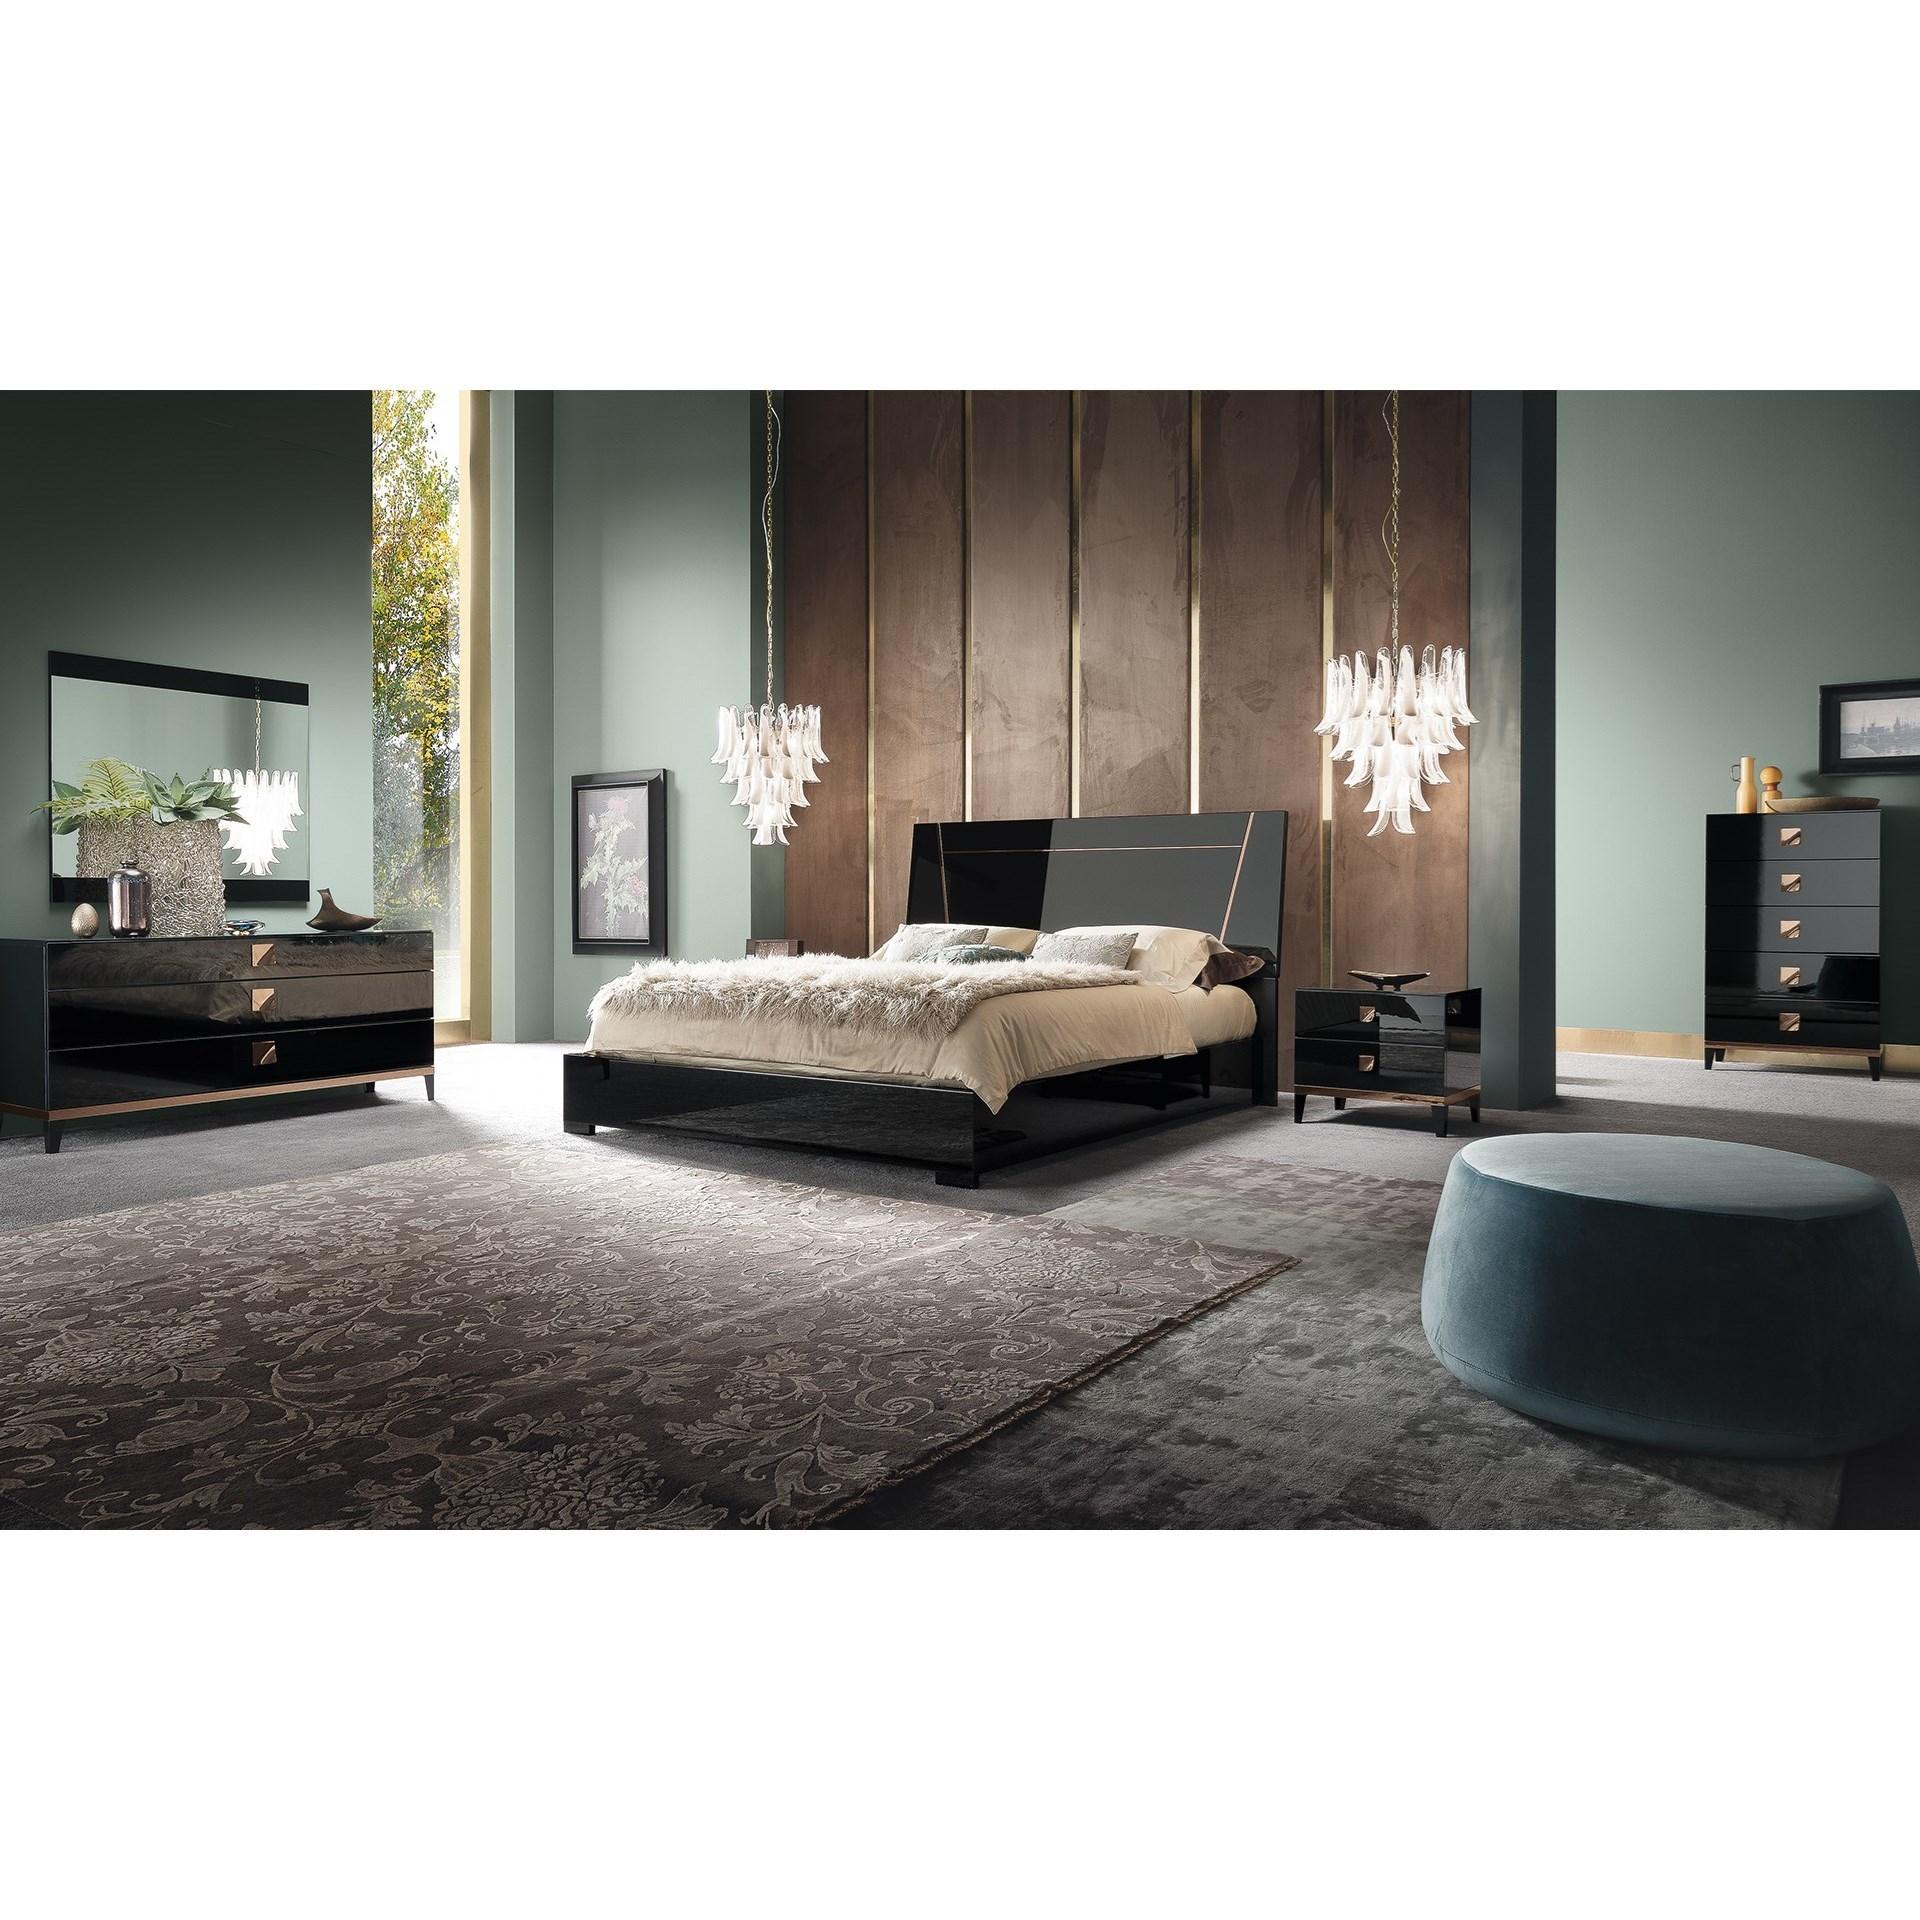 Mont Noir Queen Bedroom Group by Alf Italia at Corner Furniture